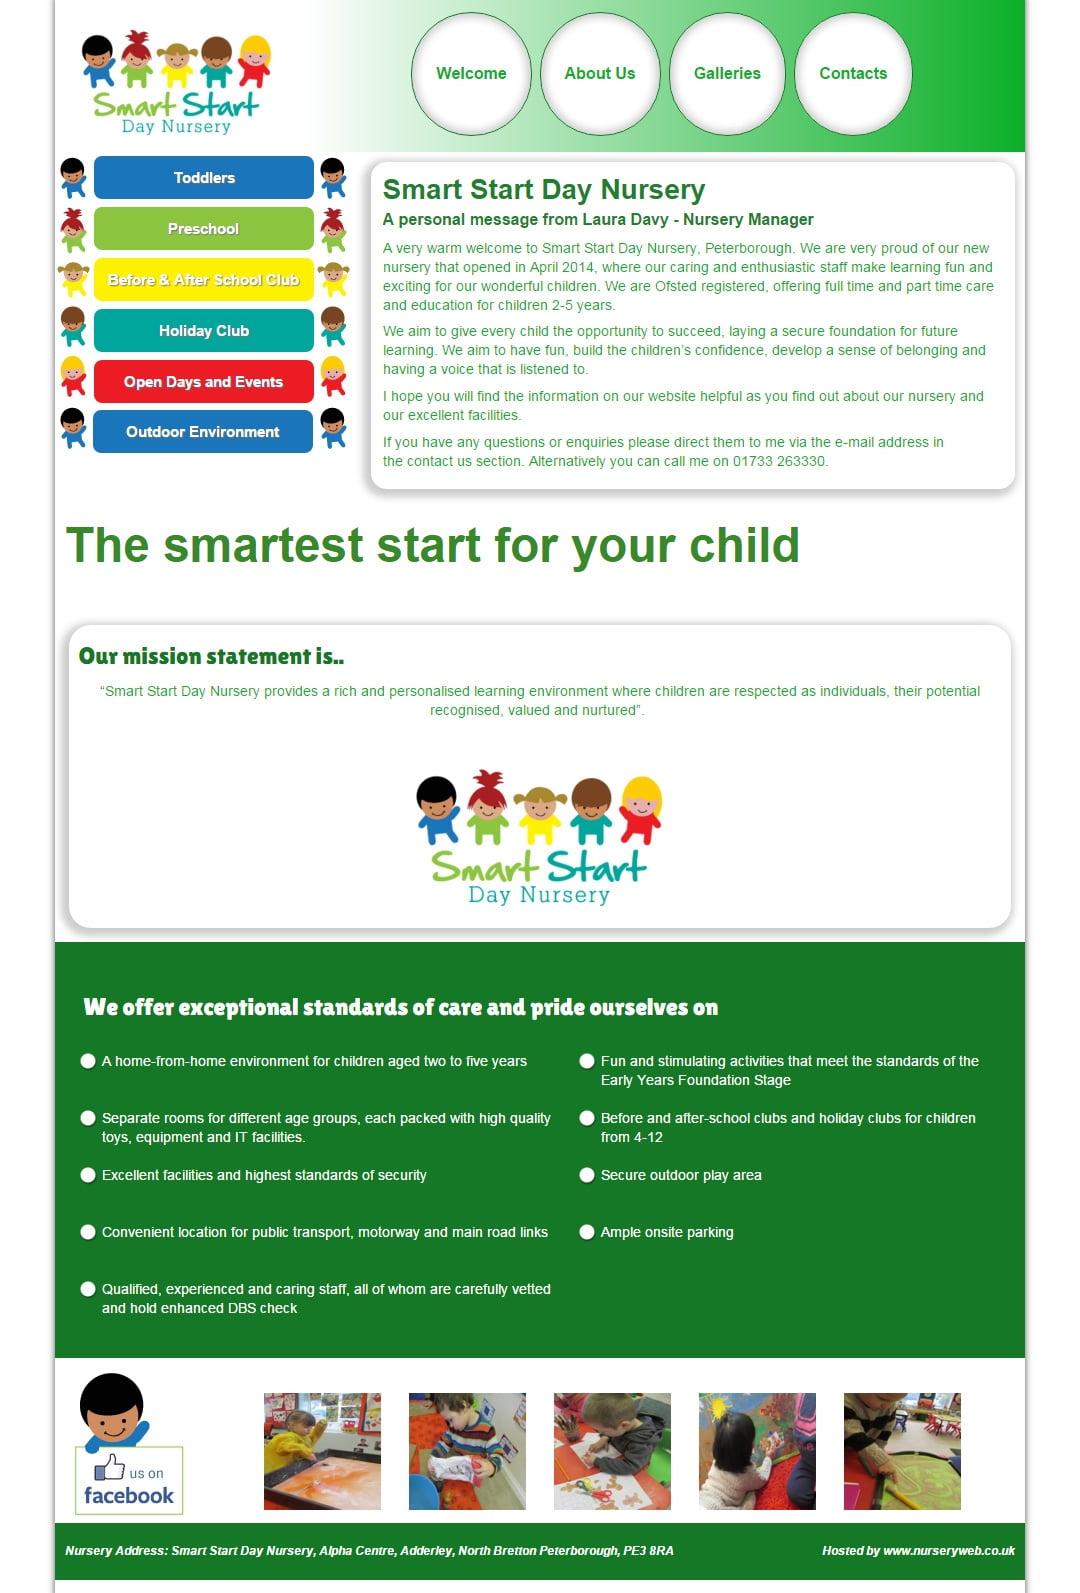 Smart Start Day Nursery